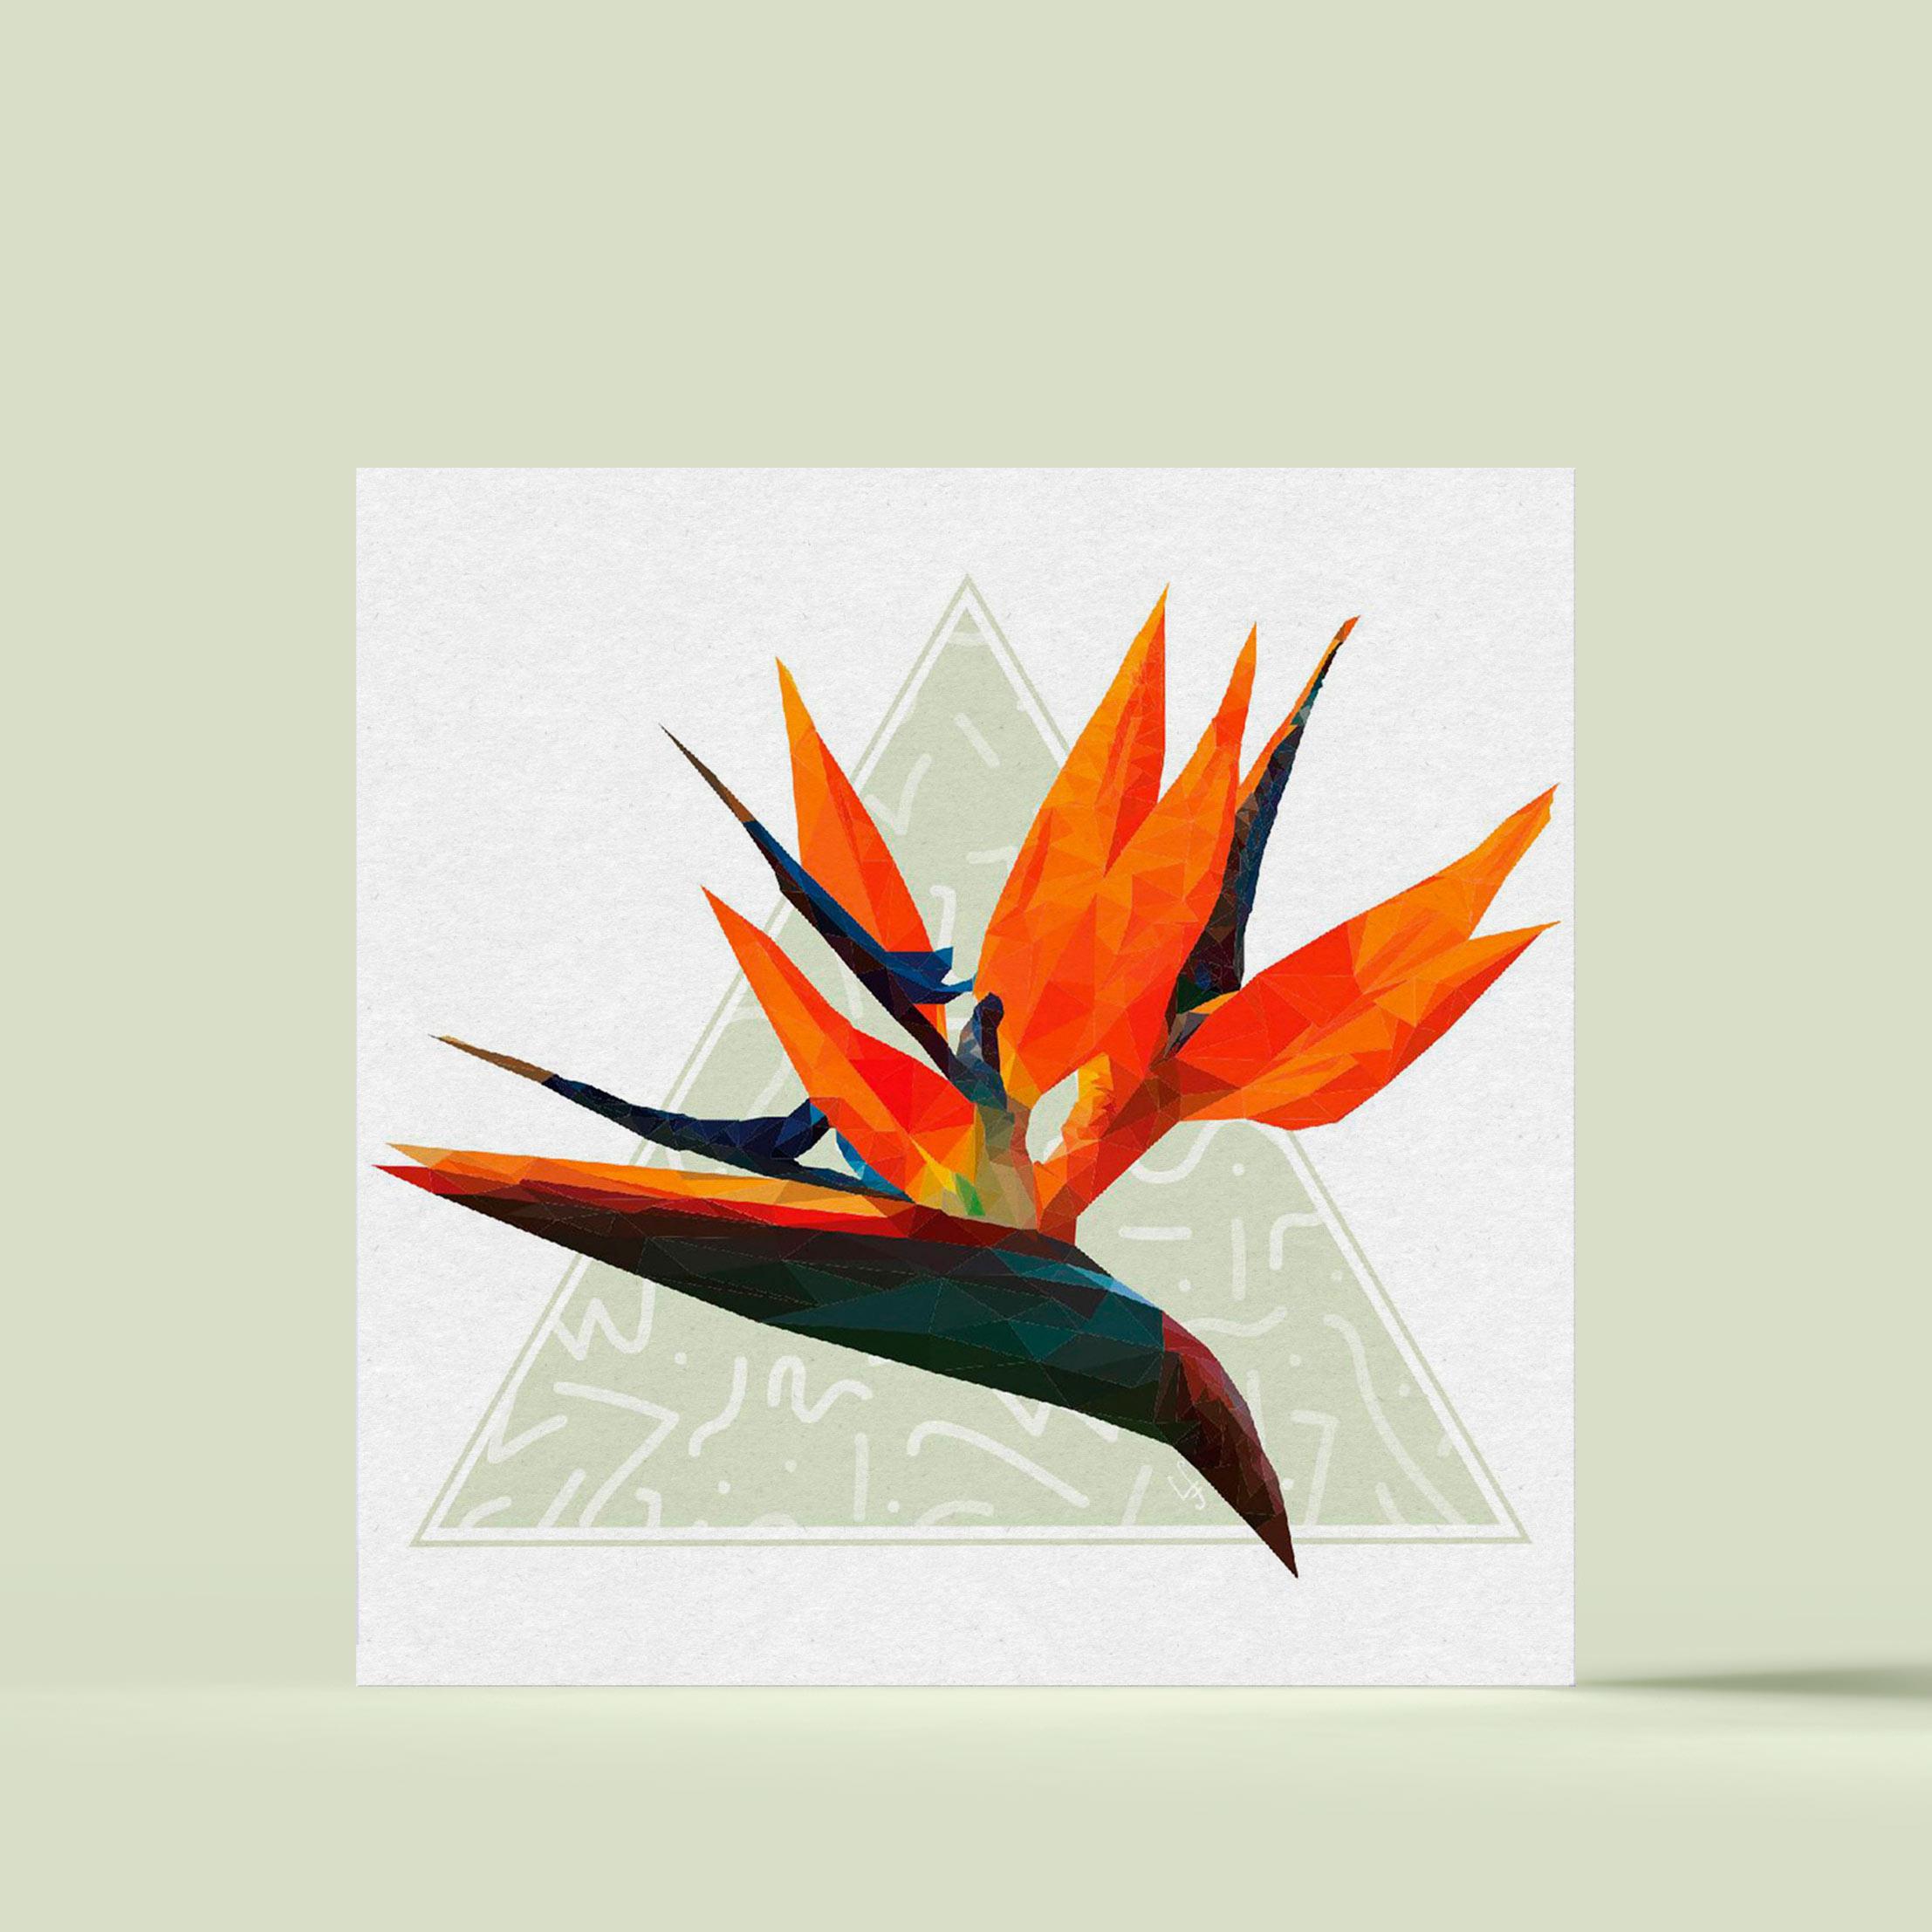 Oiseau du paradis - Illustration